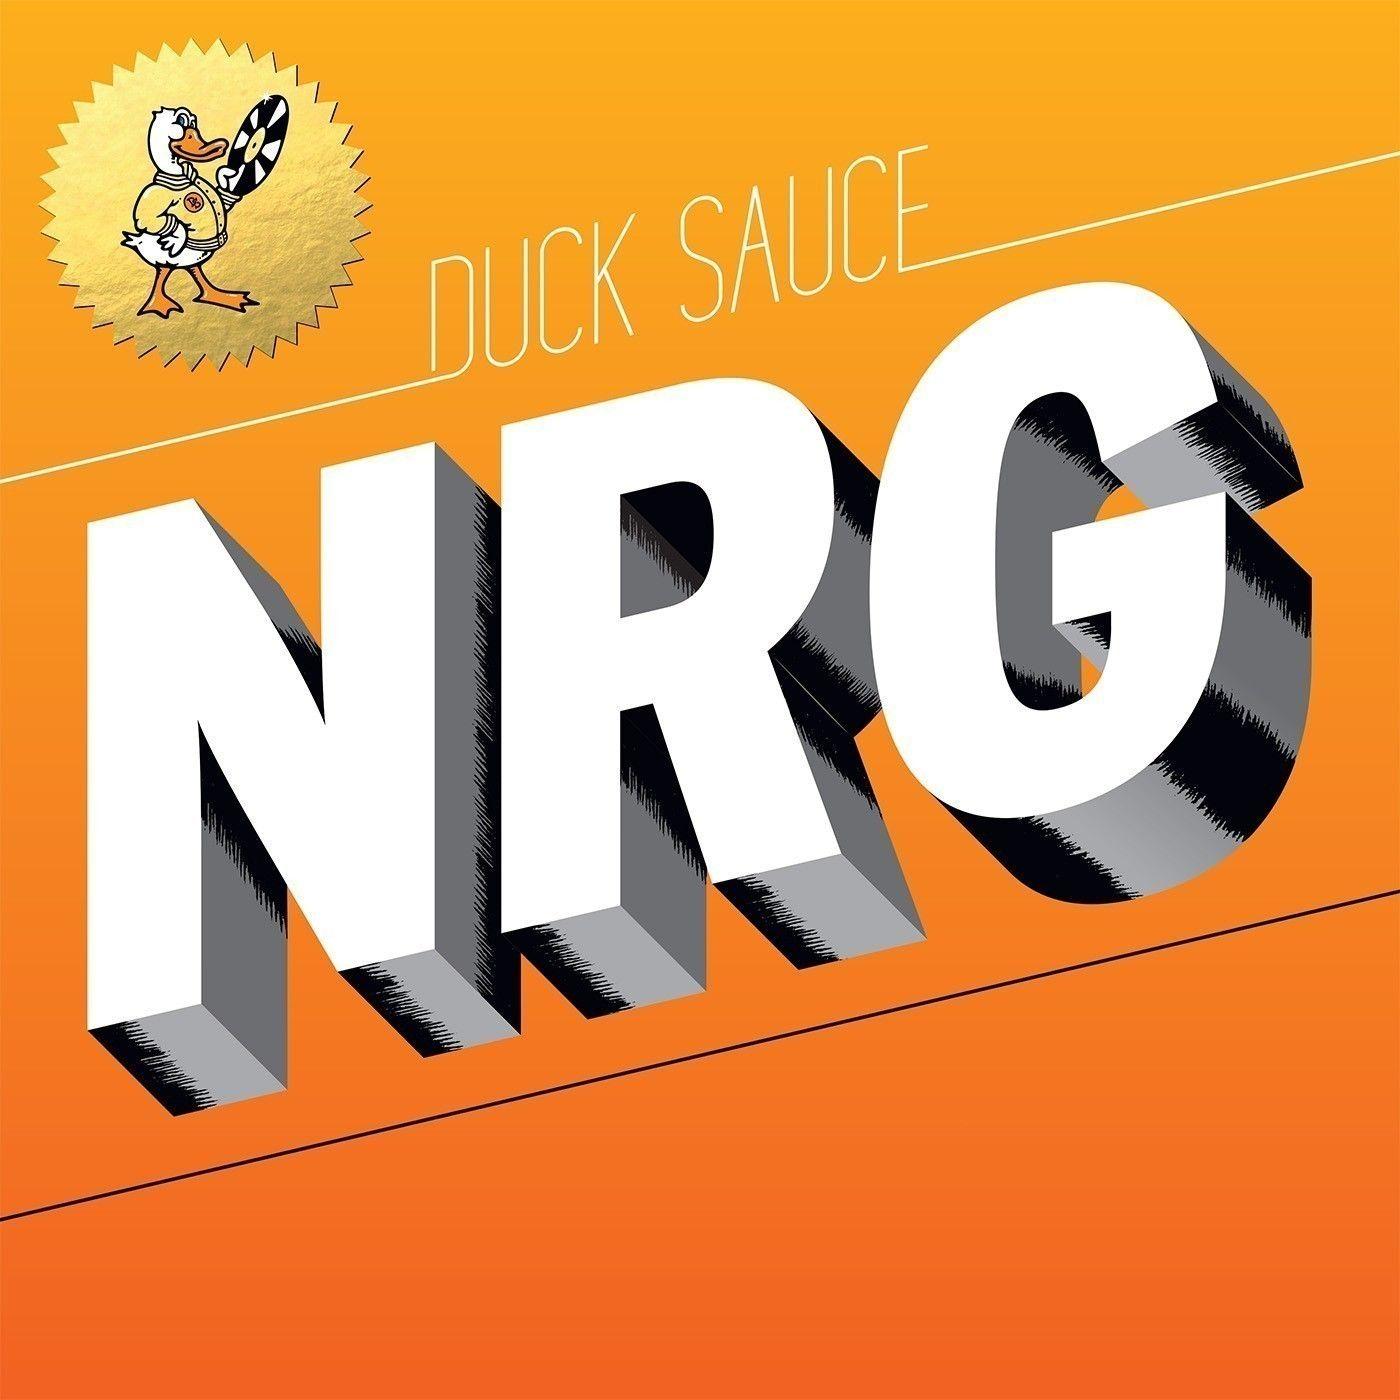 3beat181-duck-sauce-nrg-packshot.jpeg